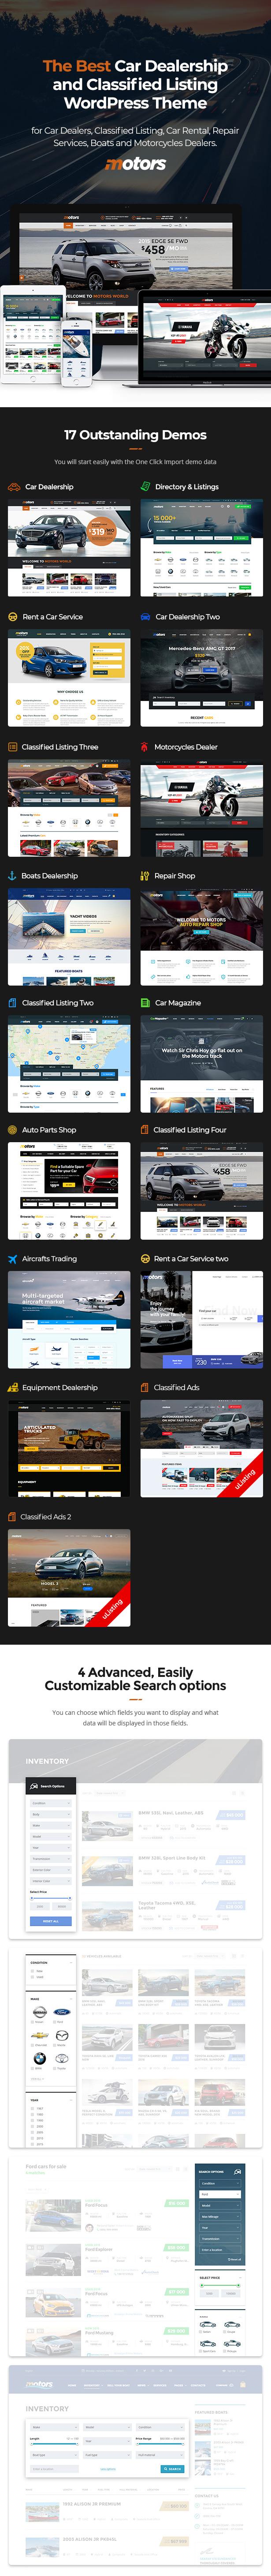 Motors - Revendedor de carros, Aluguel e Classificados tema WordPress - 4